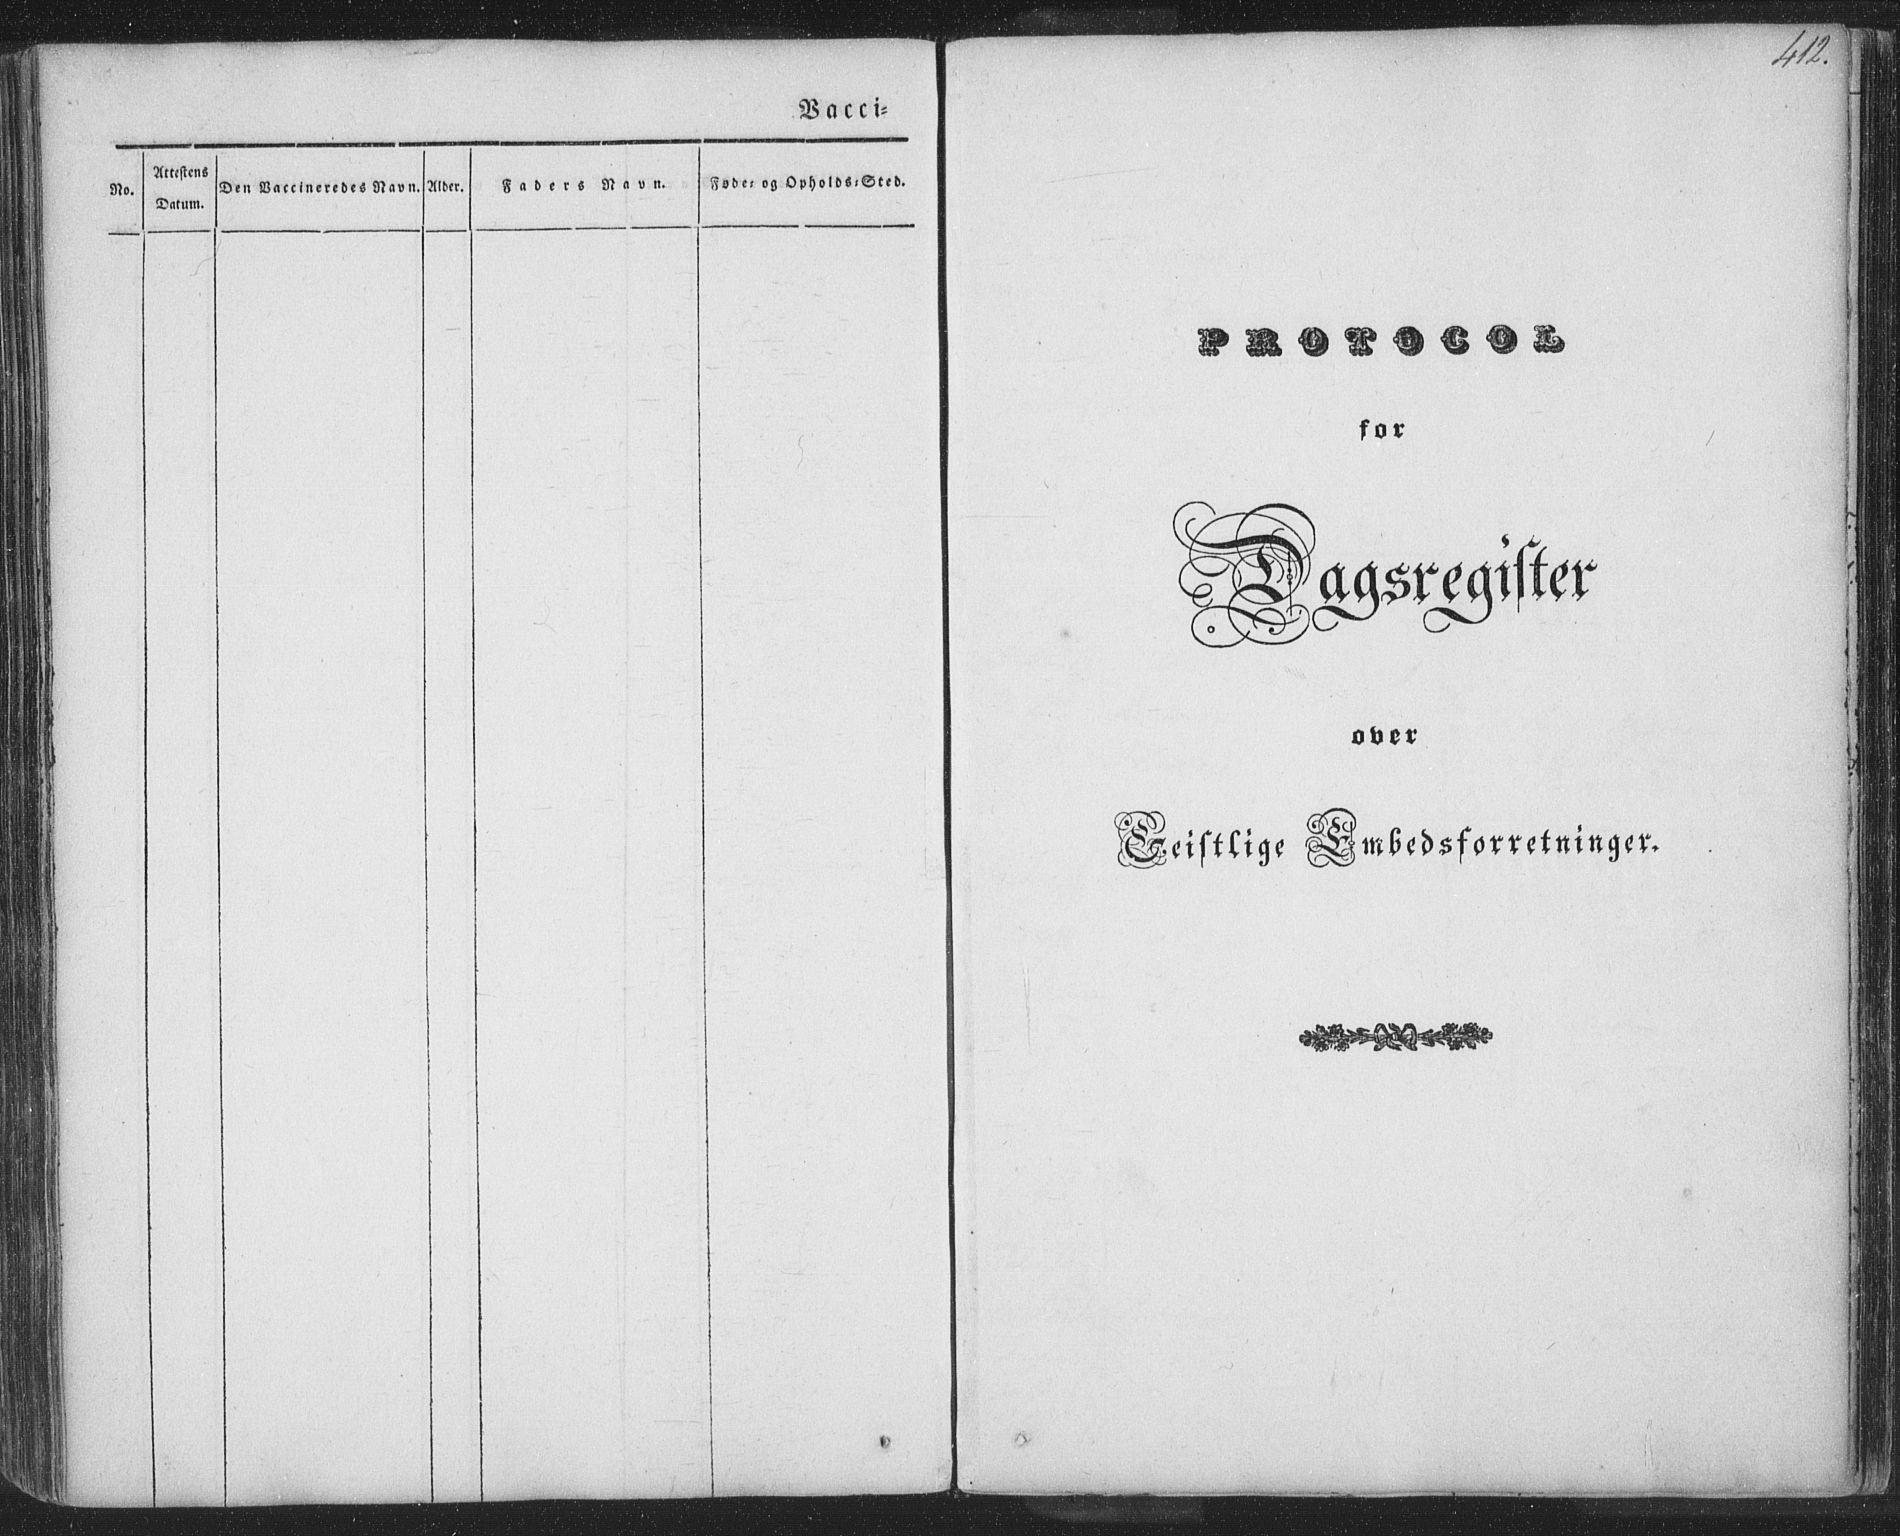 SAT, Ministerialprotokoller, klokkerbøker og fødselsregistre - Nordland, 885/L1202: Ministerialbok nr. 885A03, 1838-1859, s. 412